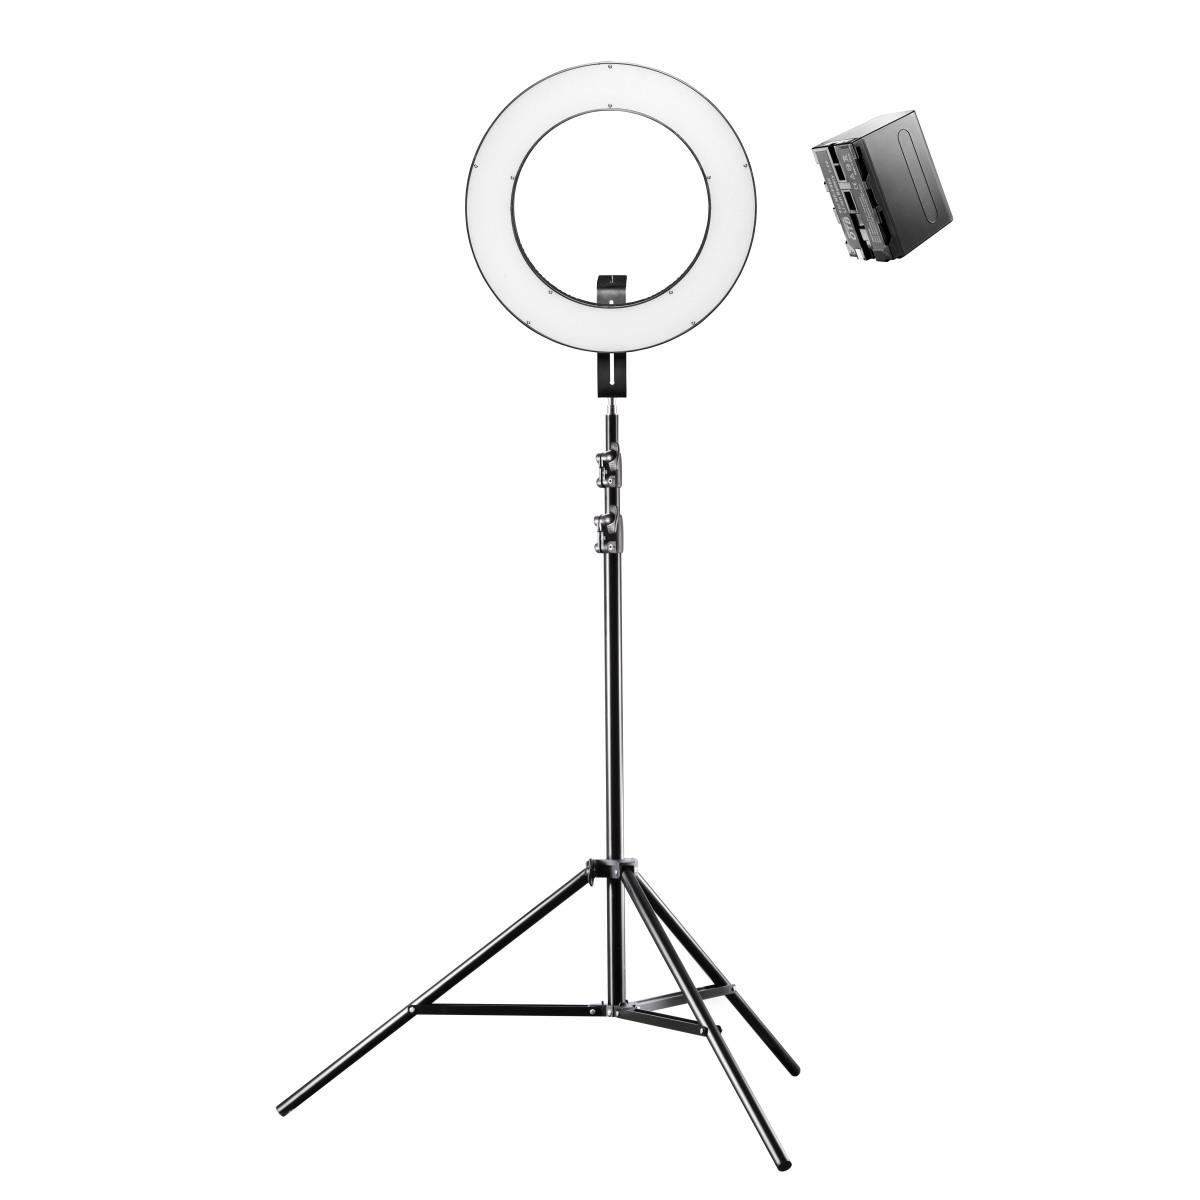 Walimex pro LED Ringleuchte 380 Bi Color Set inkl. Lampenstativ und Akku